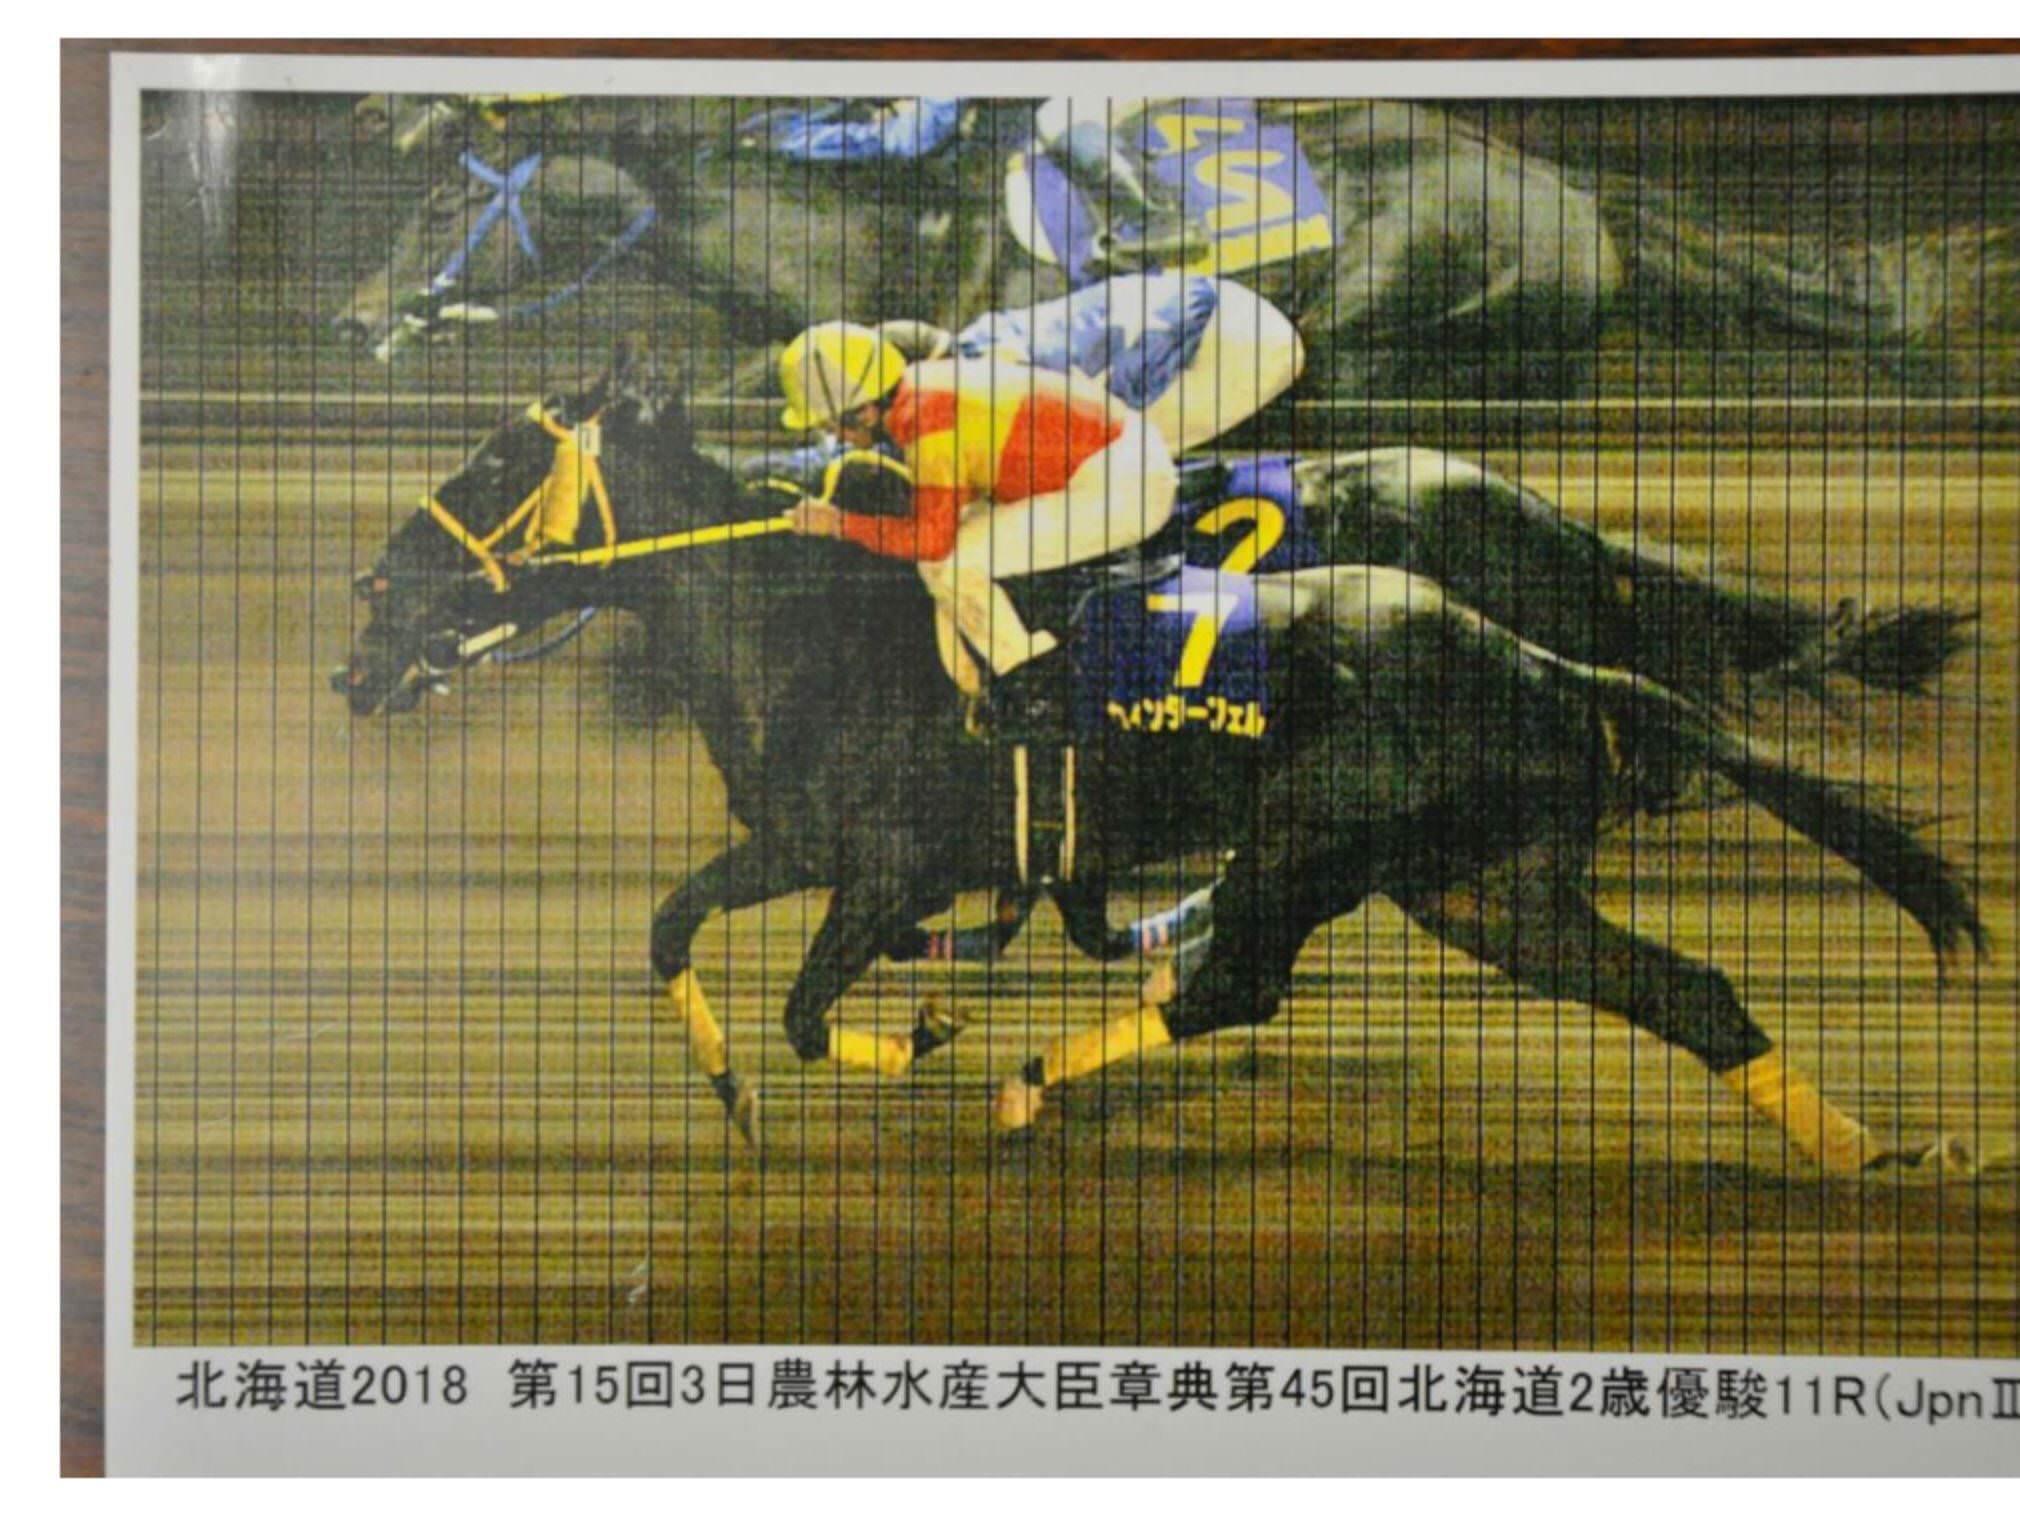 mnewsplus 1541151246 503 - ホッカイドウ競馬で誤審!北海道2歳優駿で1、2位の着順を逆に!